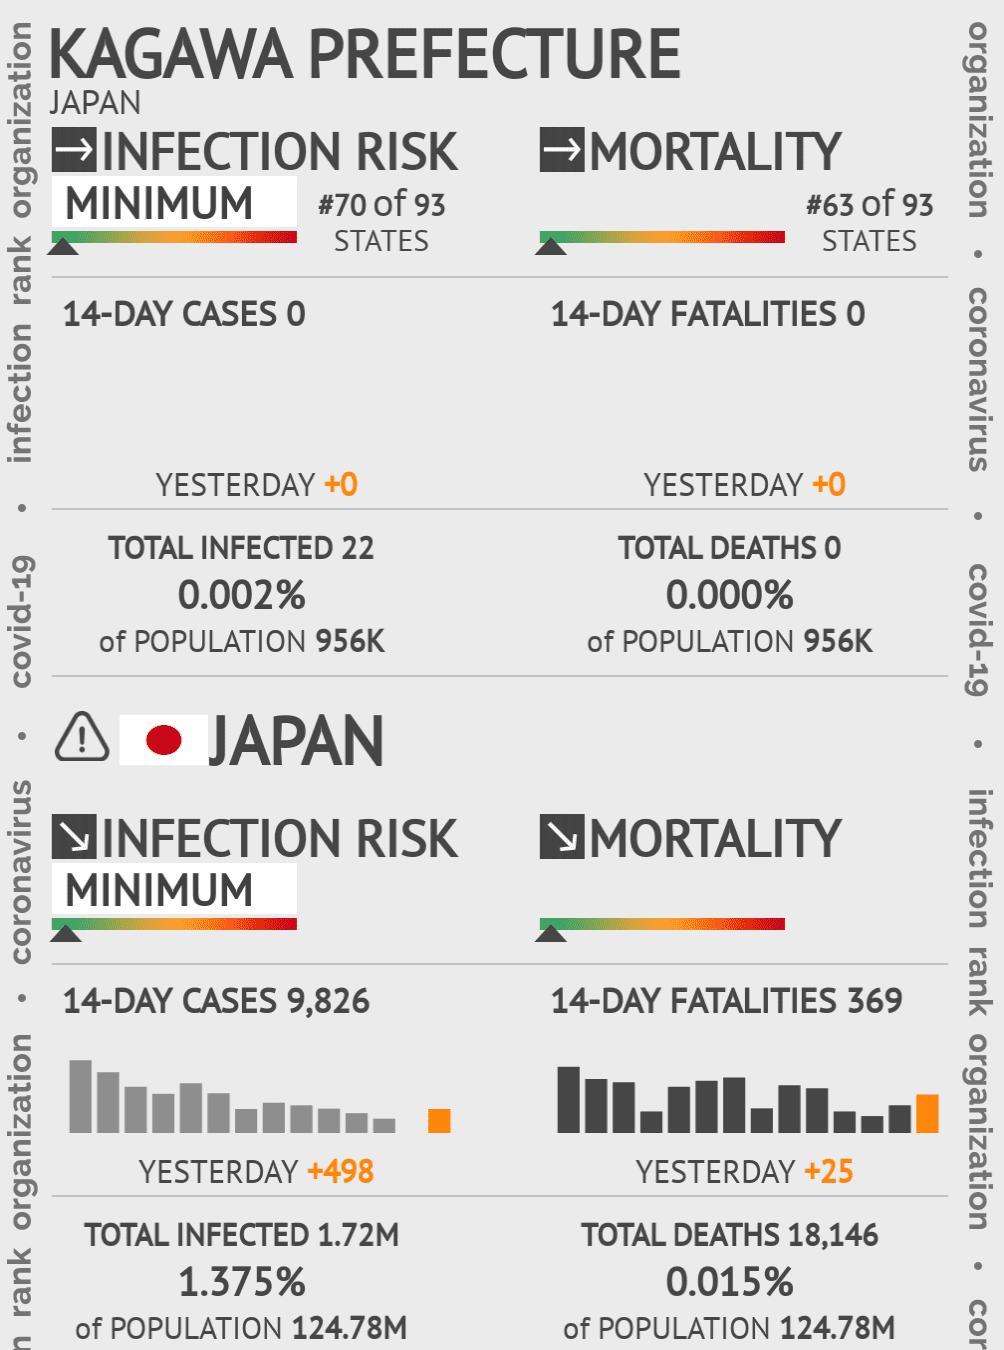 Kagawa Prefecture Coronavirus Covid-19 Risk of Infection on May 14, 2020